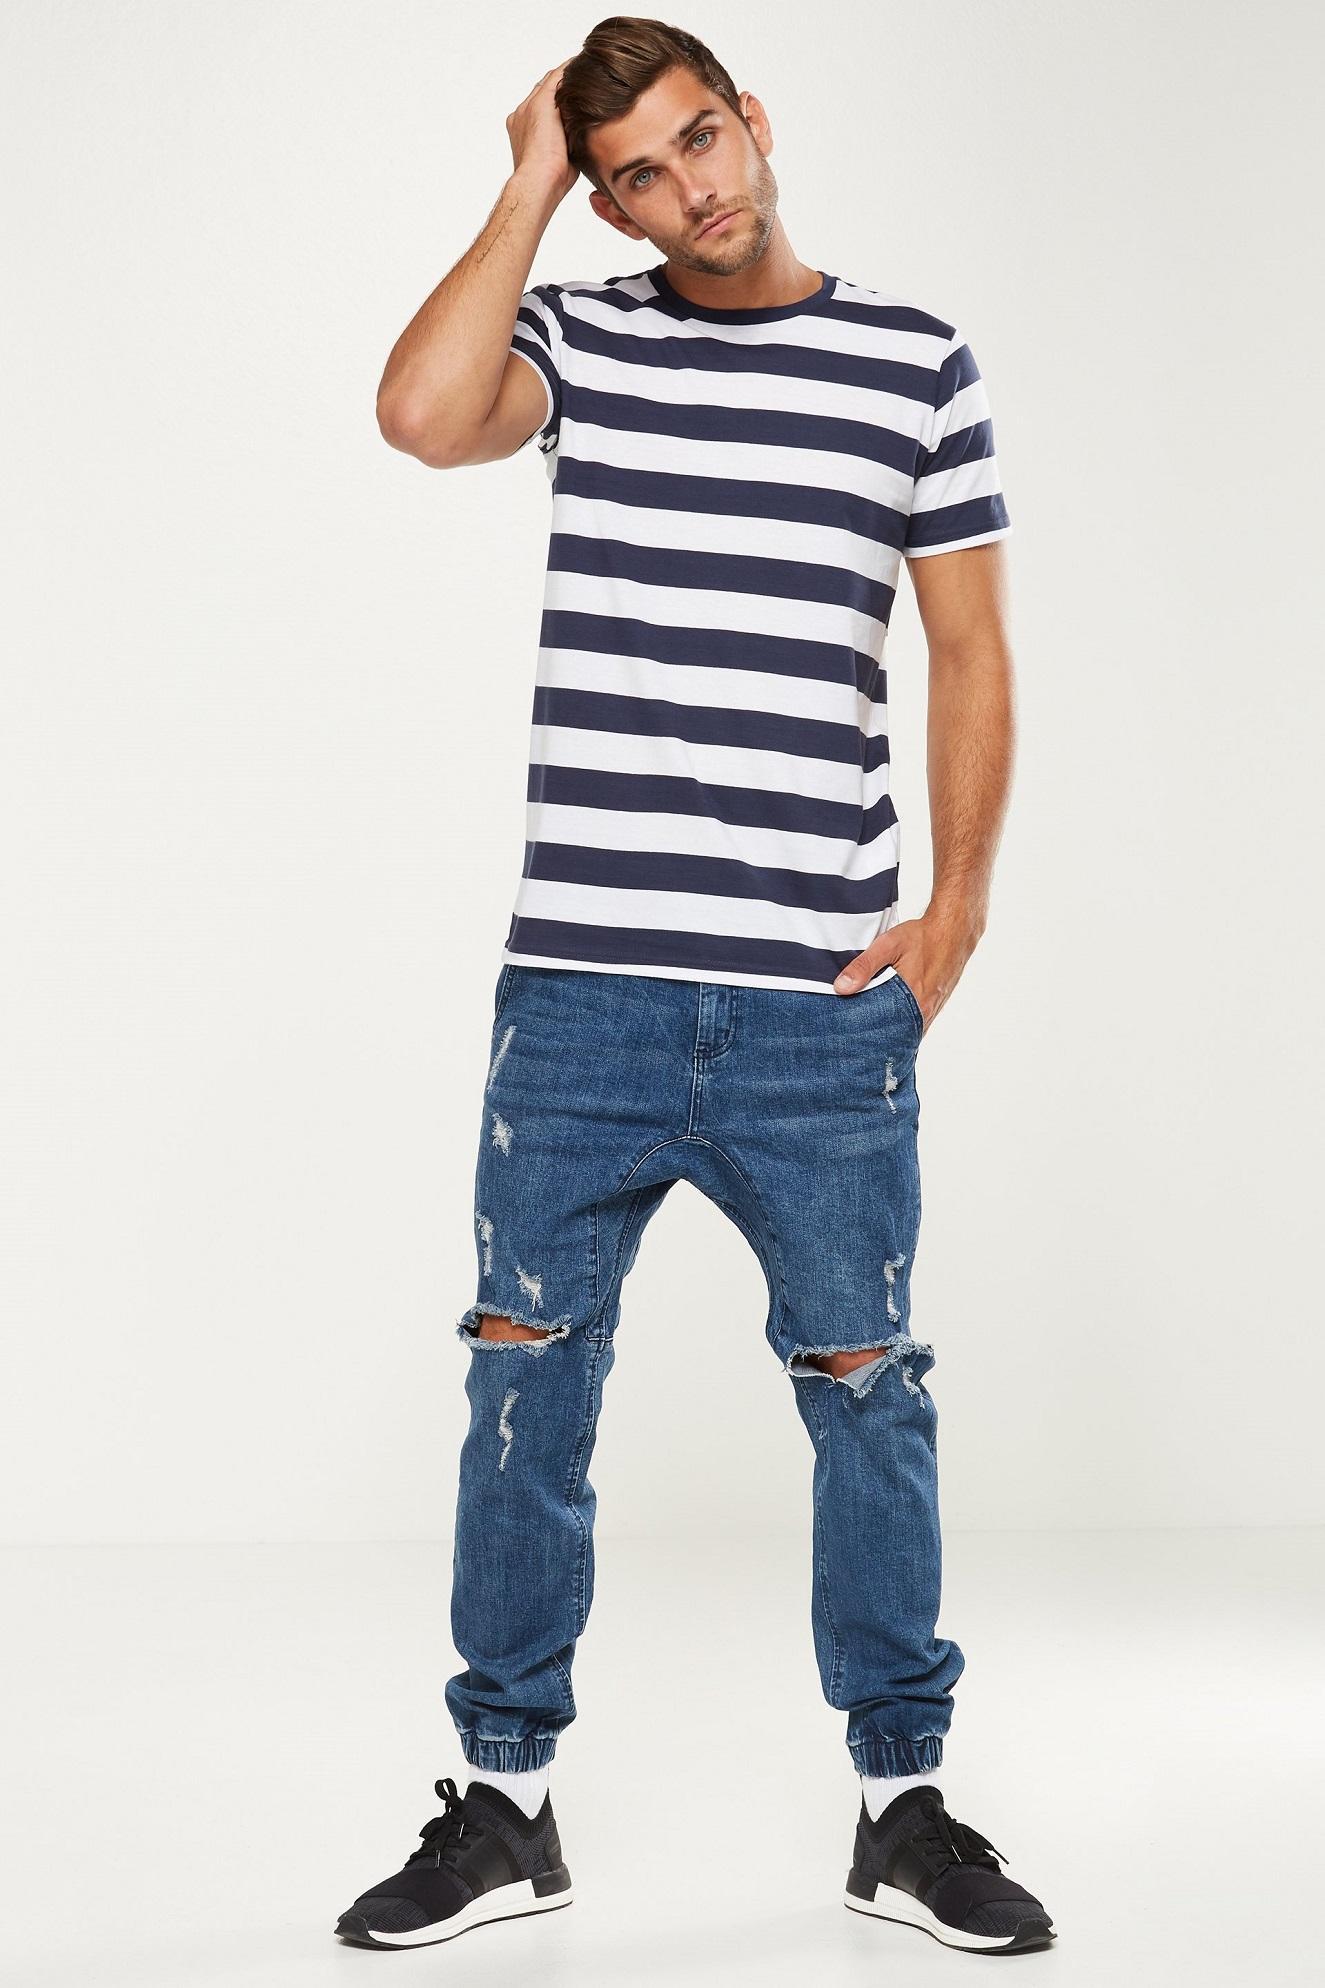 Fitur Kaos Big Stripe Navy White Besar Putih Dan Polos Black 3